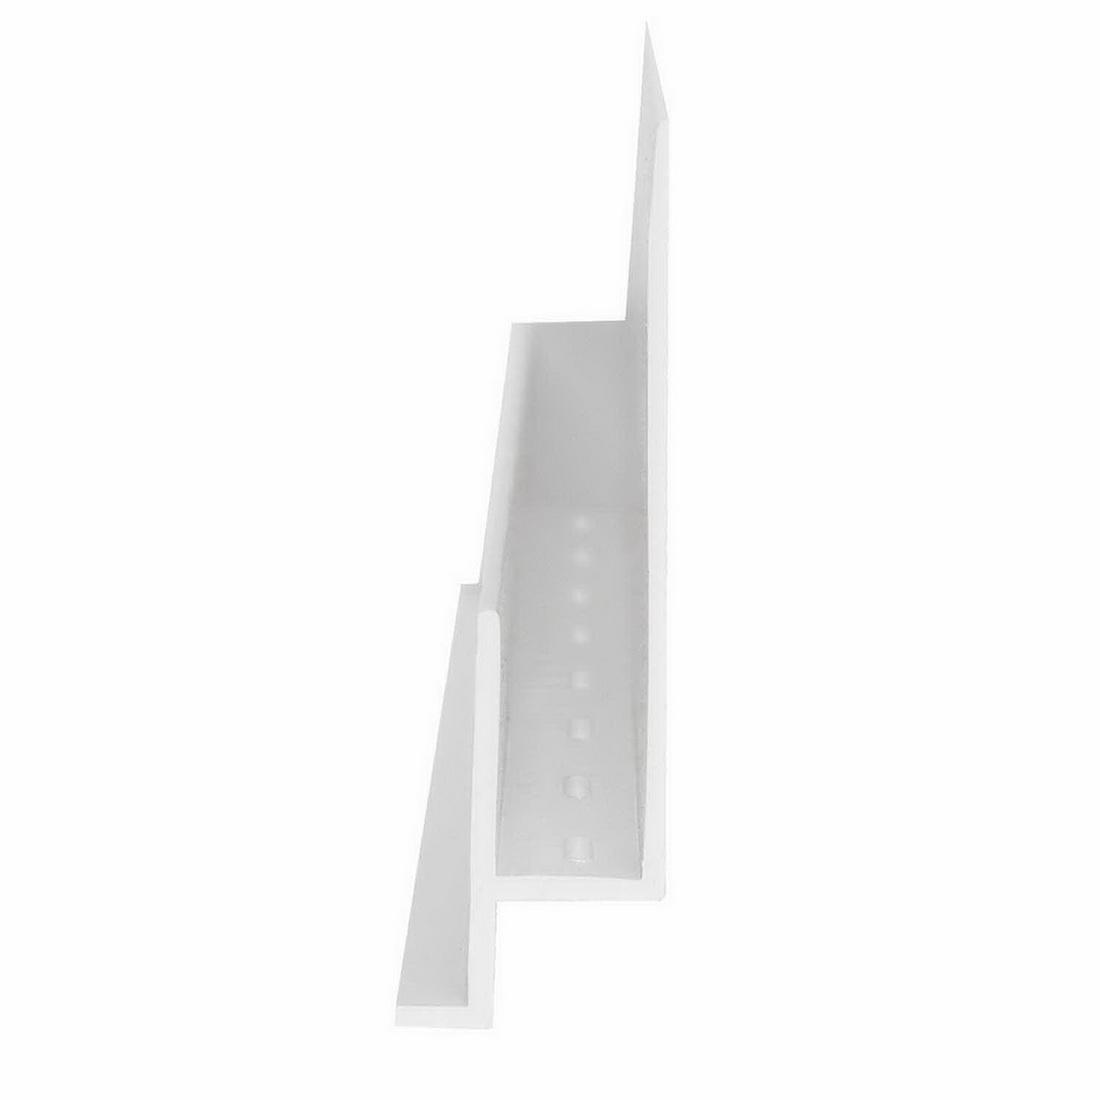 2.2m K-Strip Sheet Cavity Vent Fix